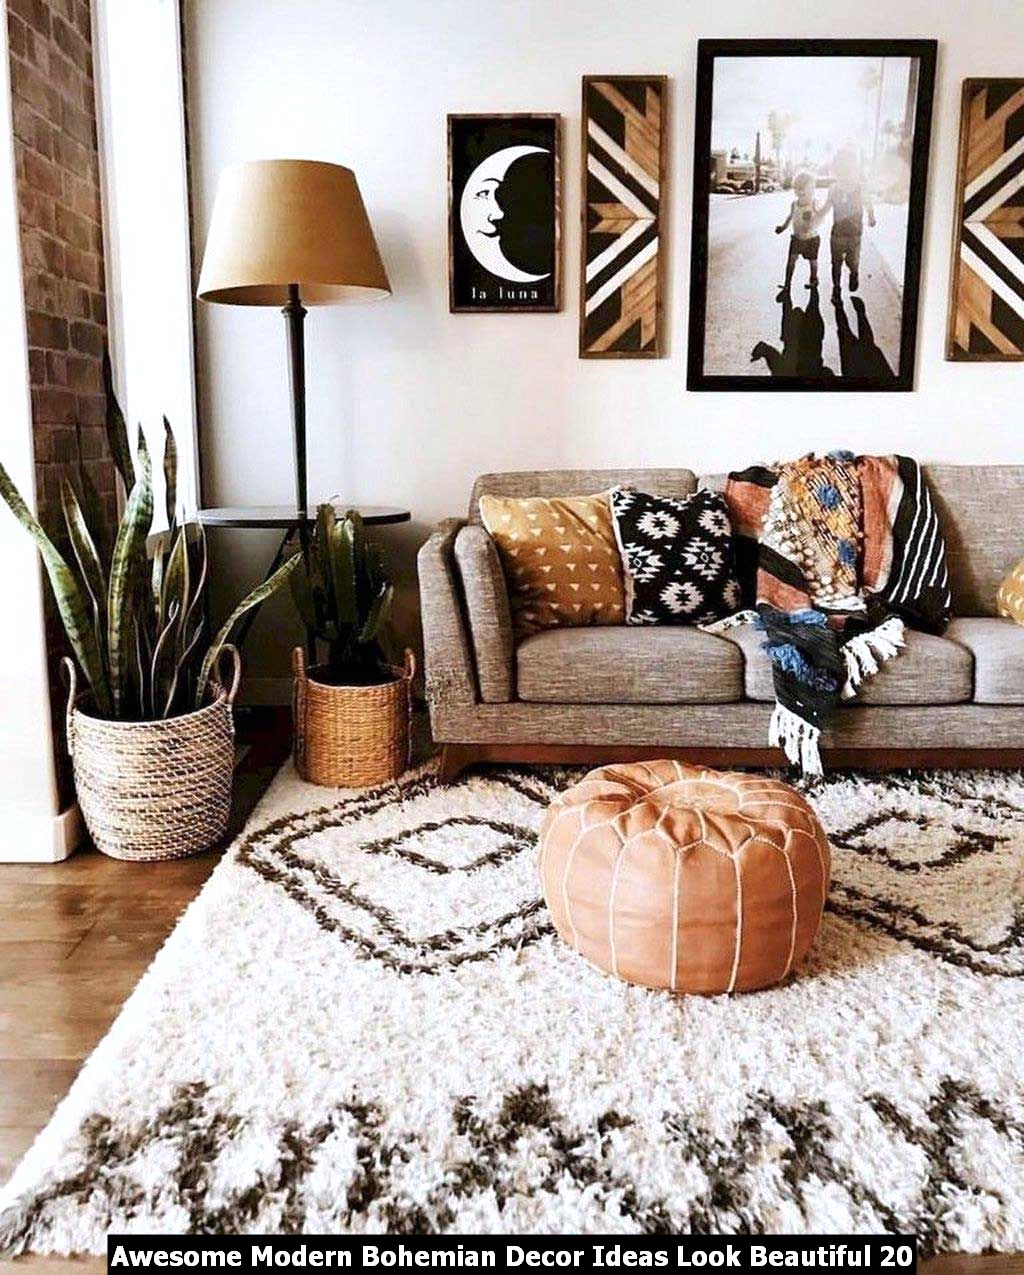 Awesome Modern Bohemian Decor Ideas Look Beautiful 20